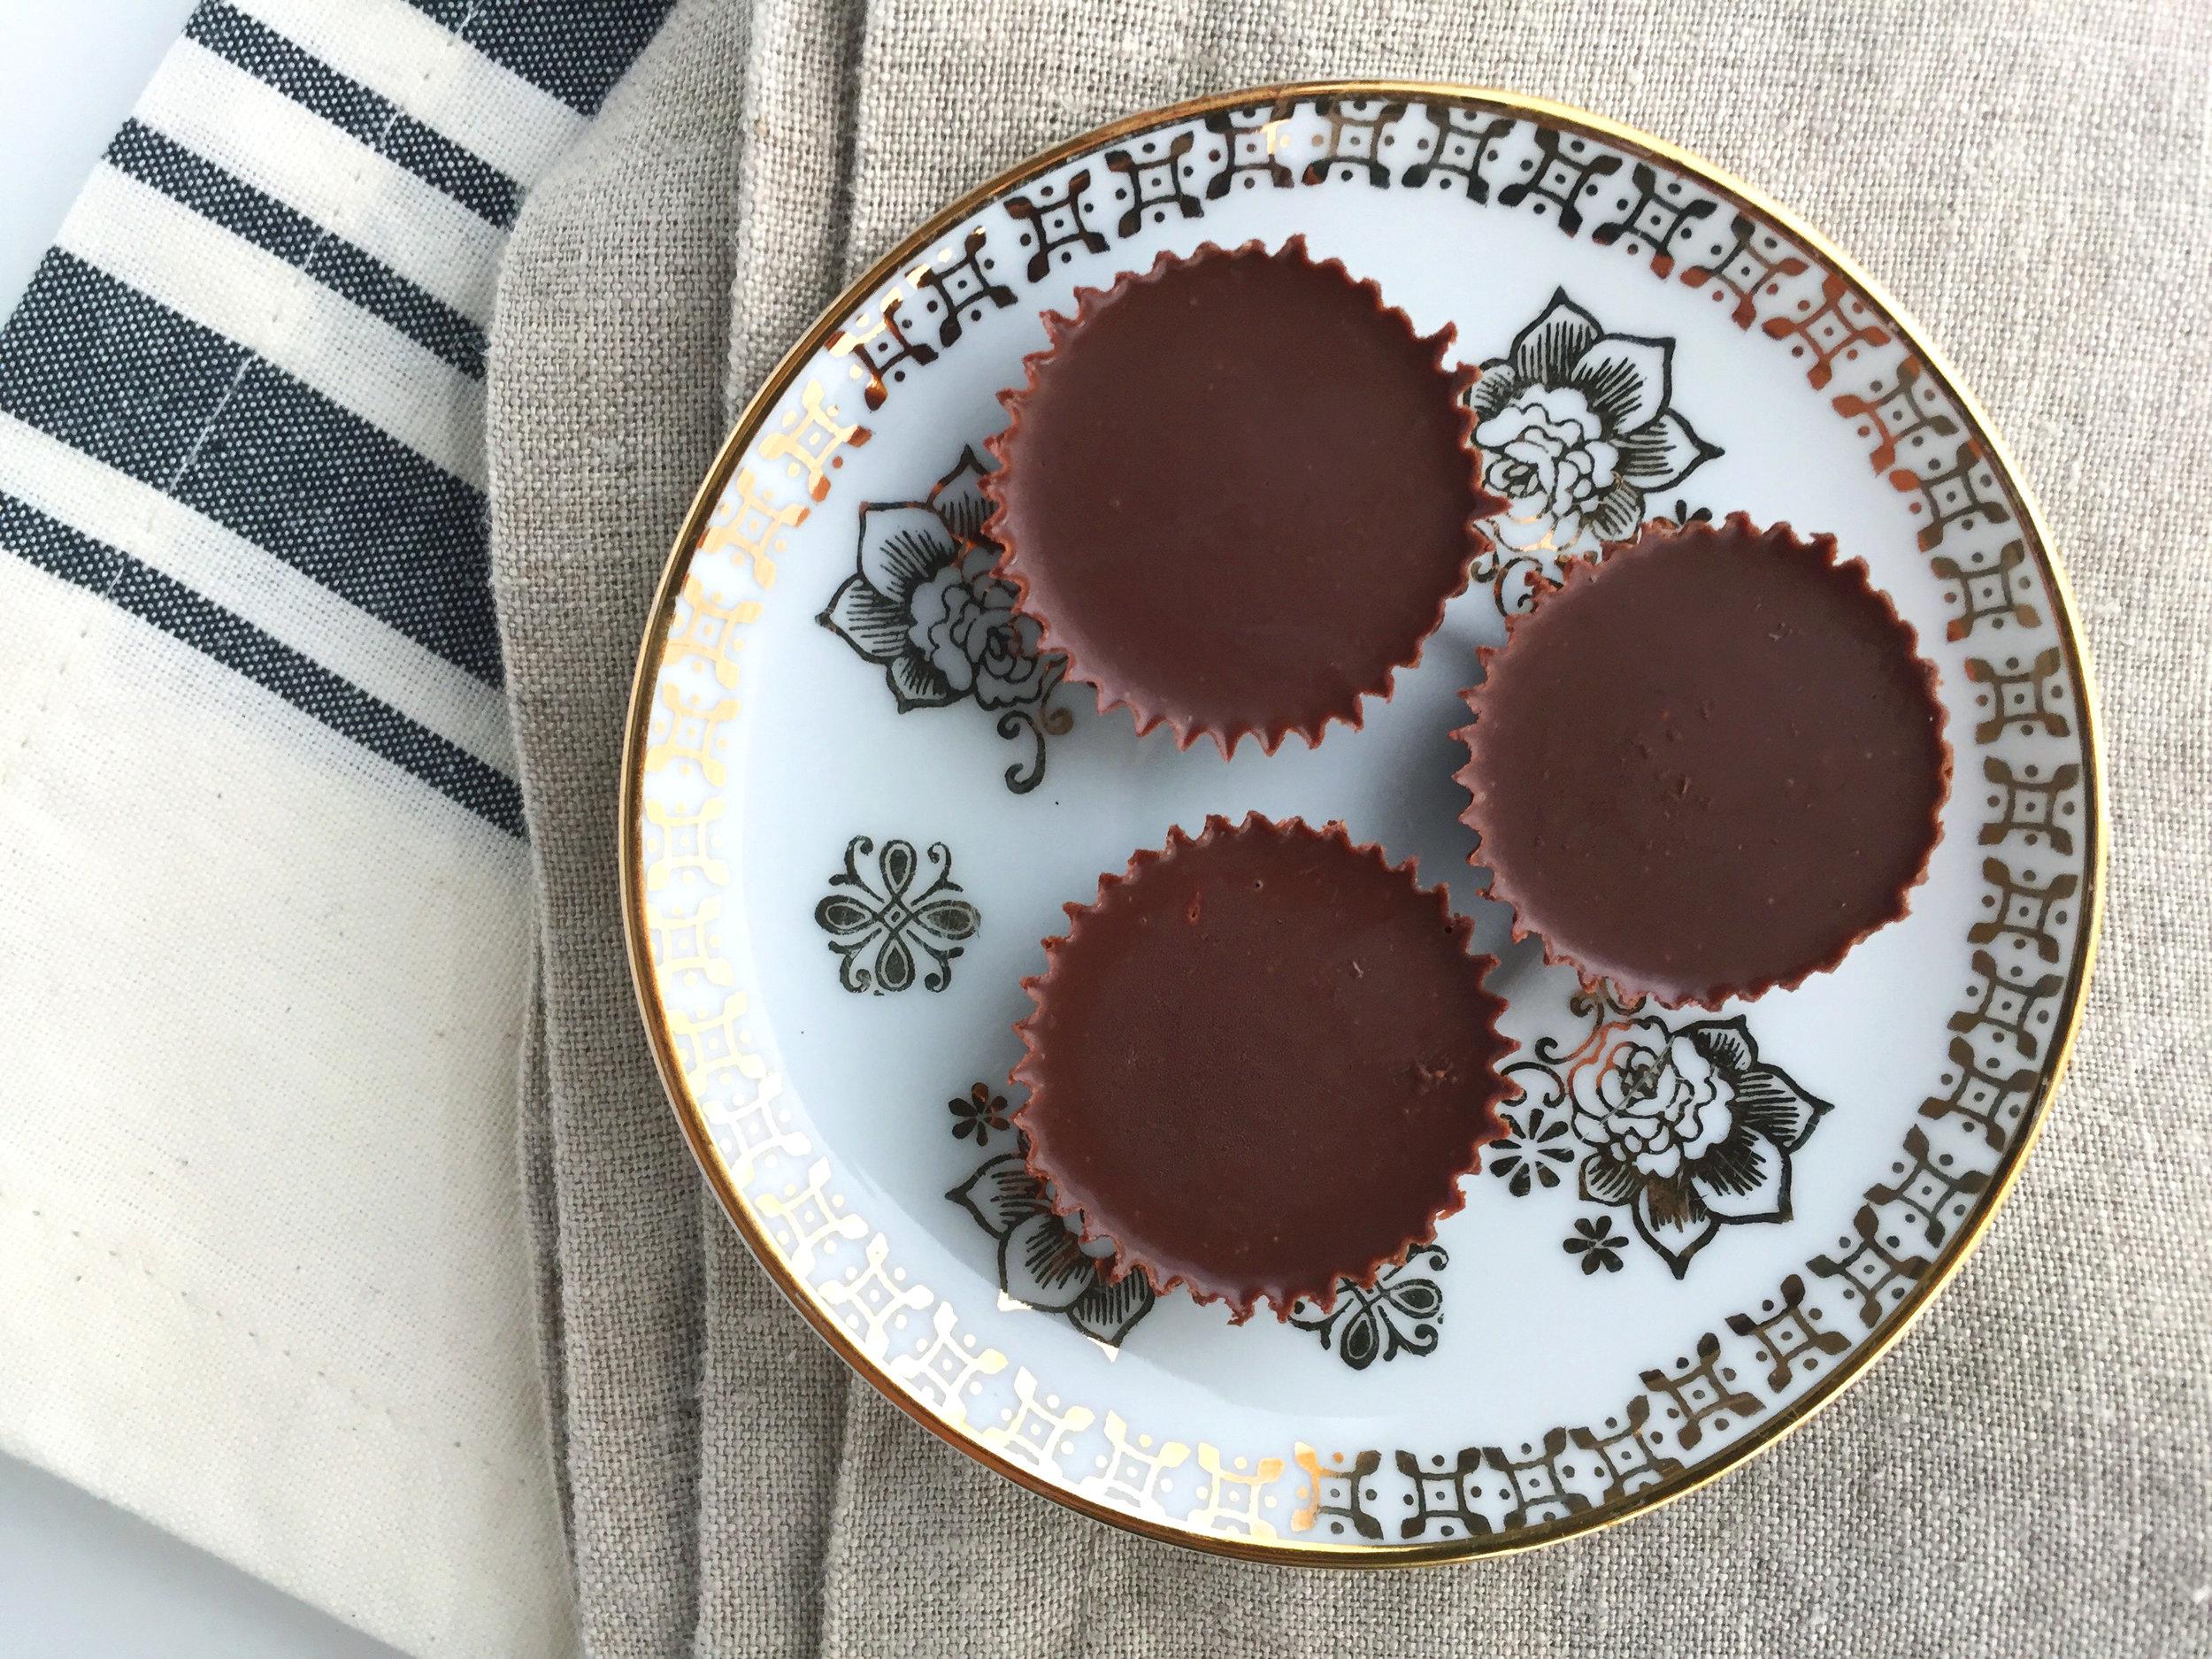 velvety chocolate coins